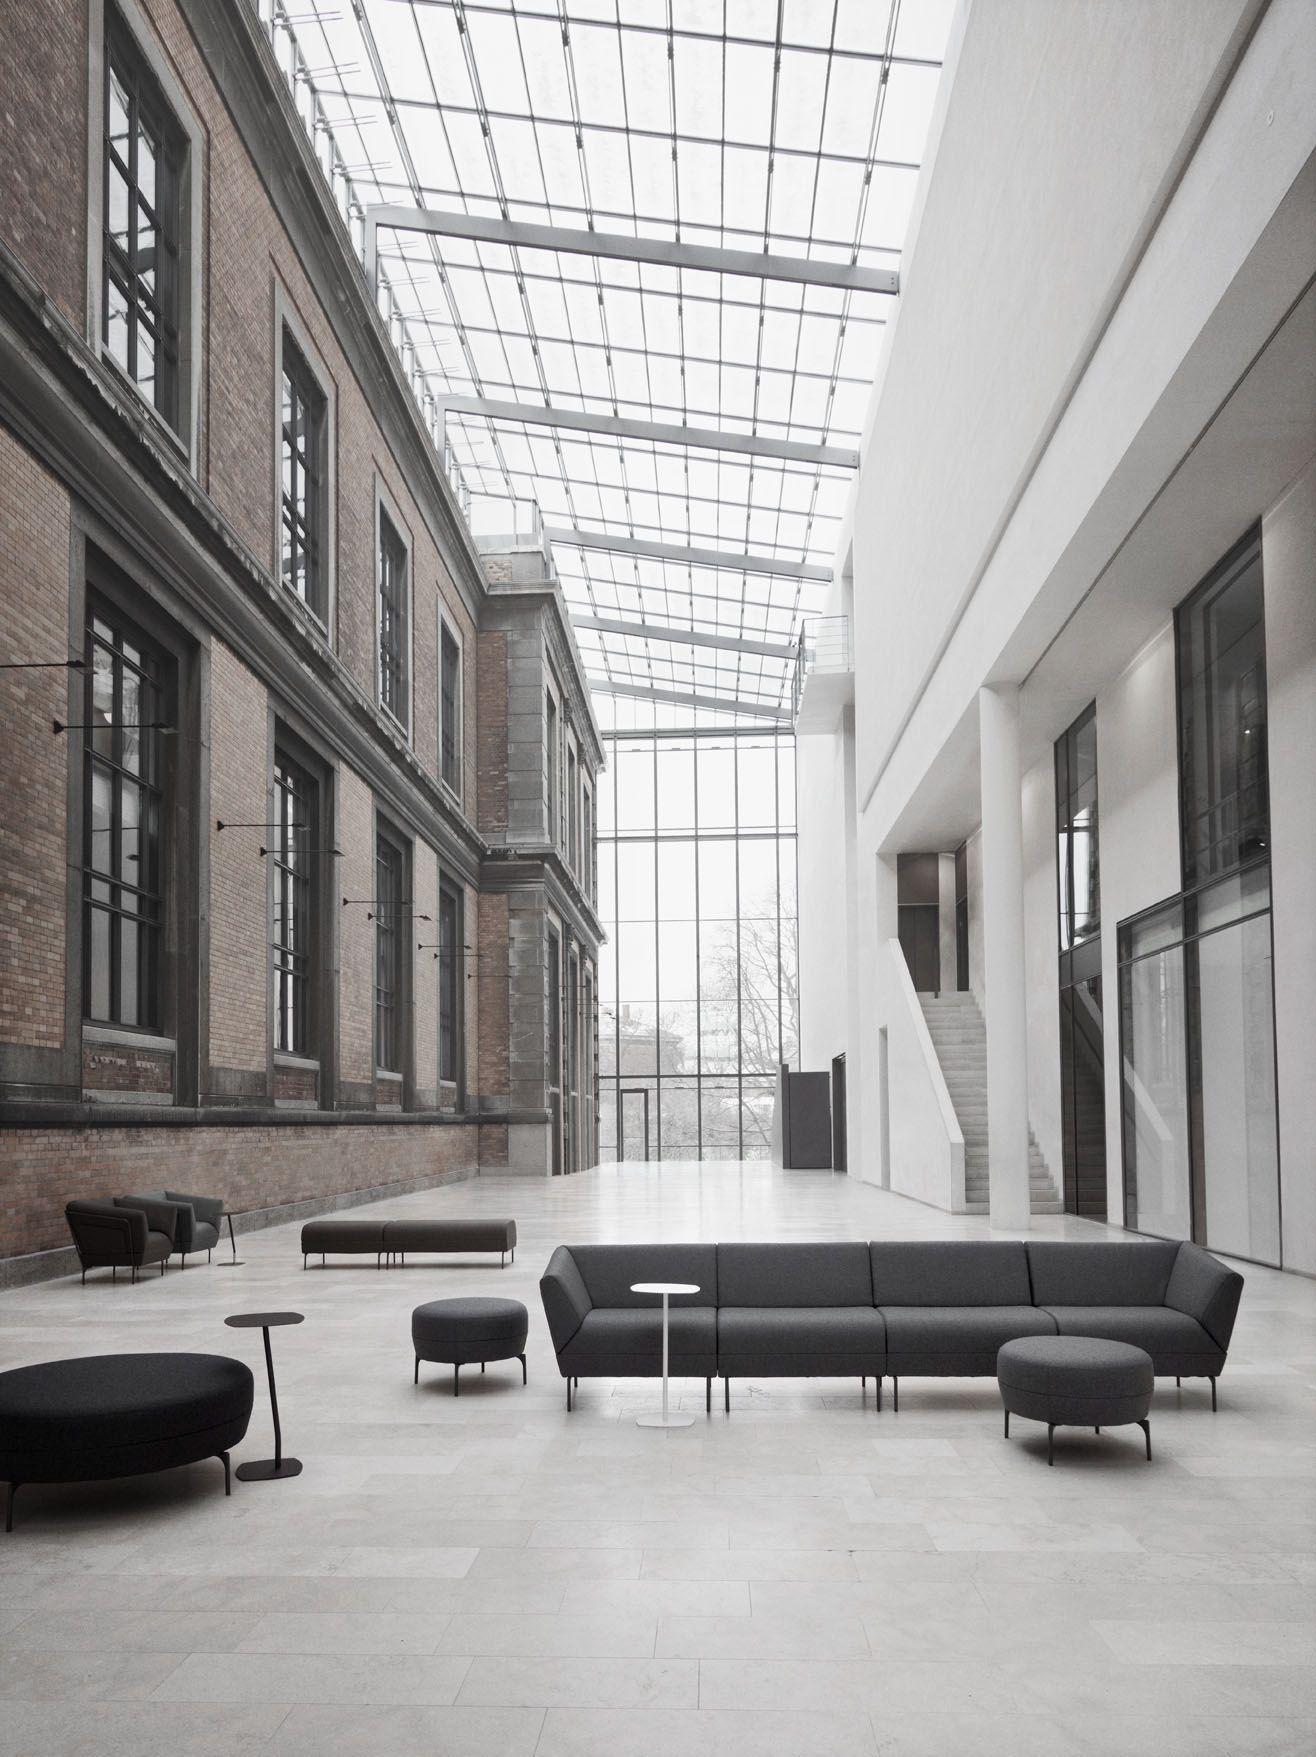 Random Inspiration 162 Brick ArchitectureArchitecture Interior DesignUrban